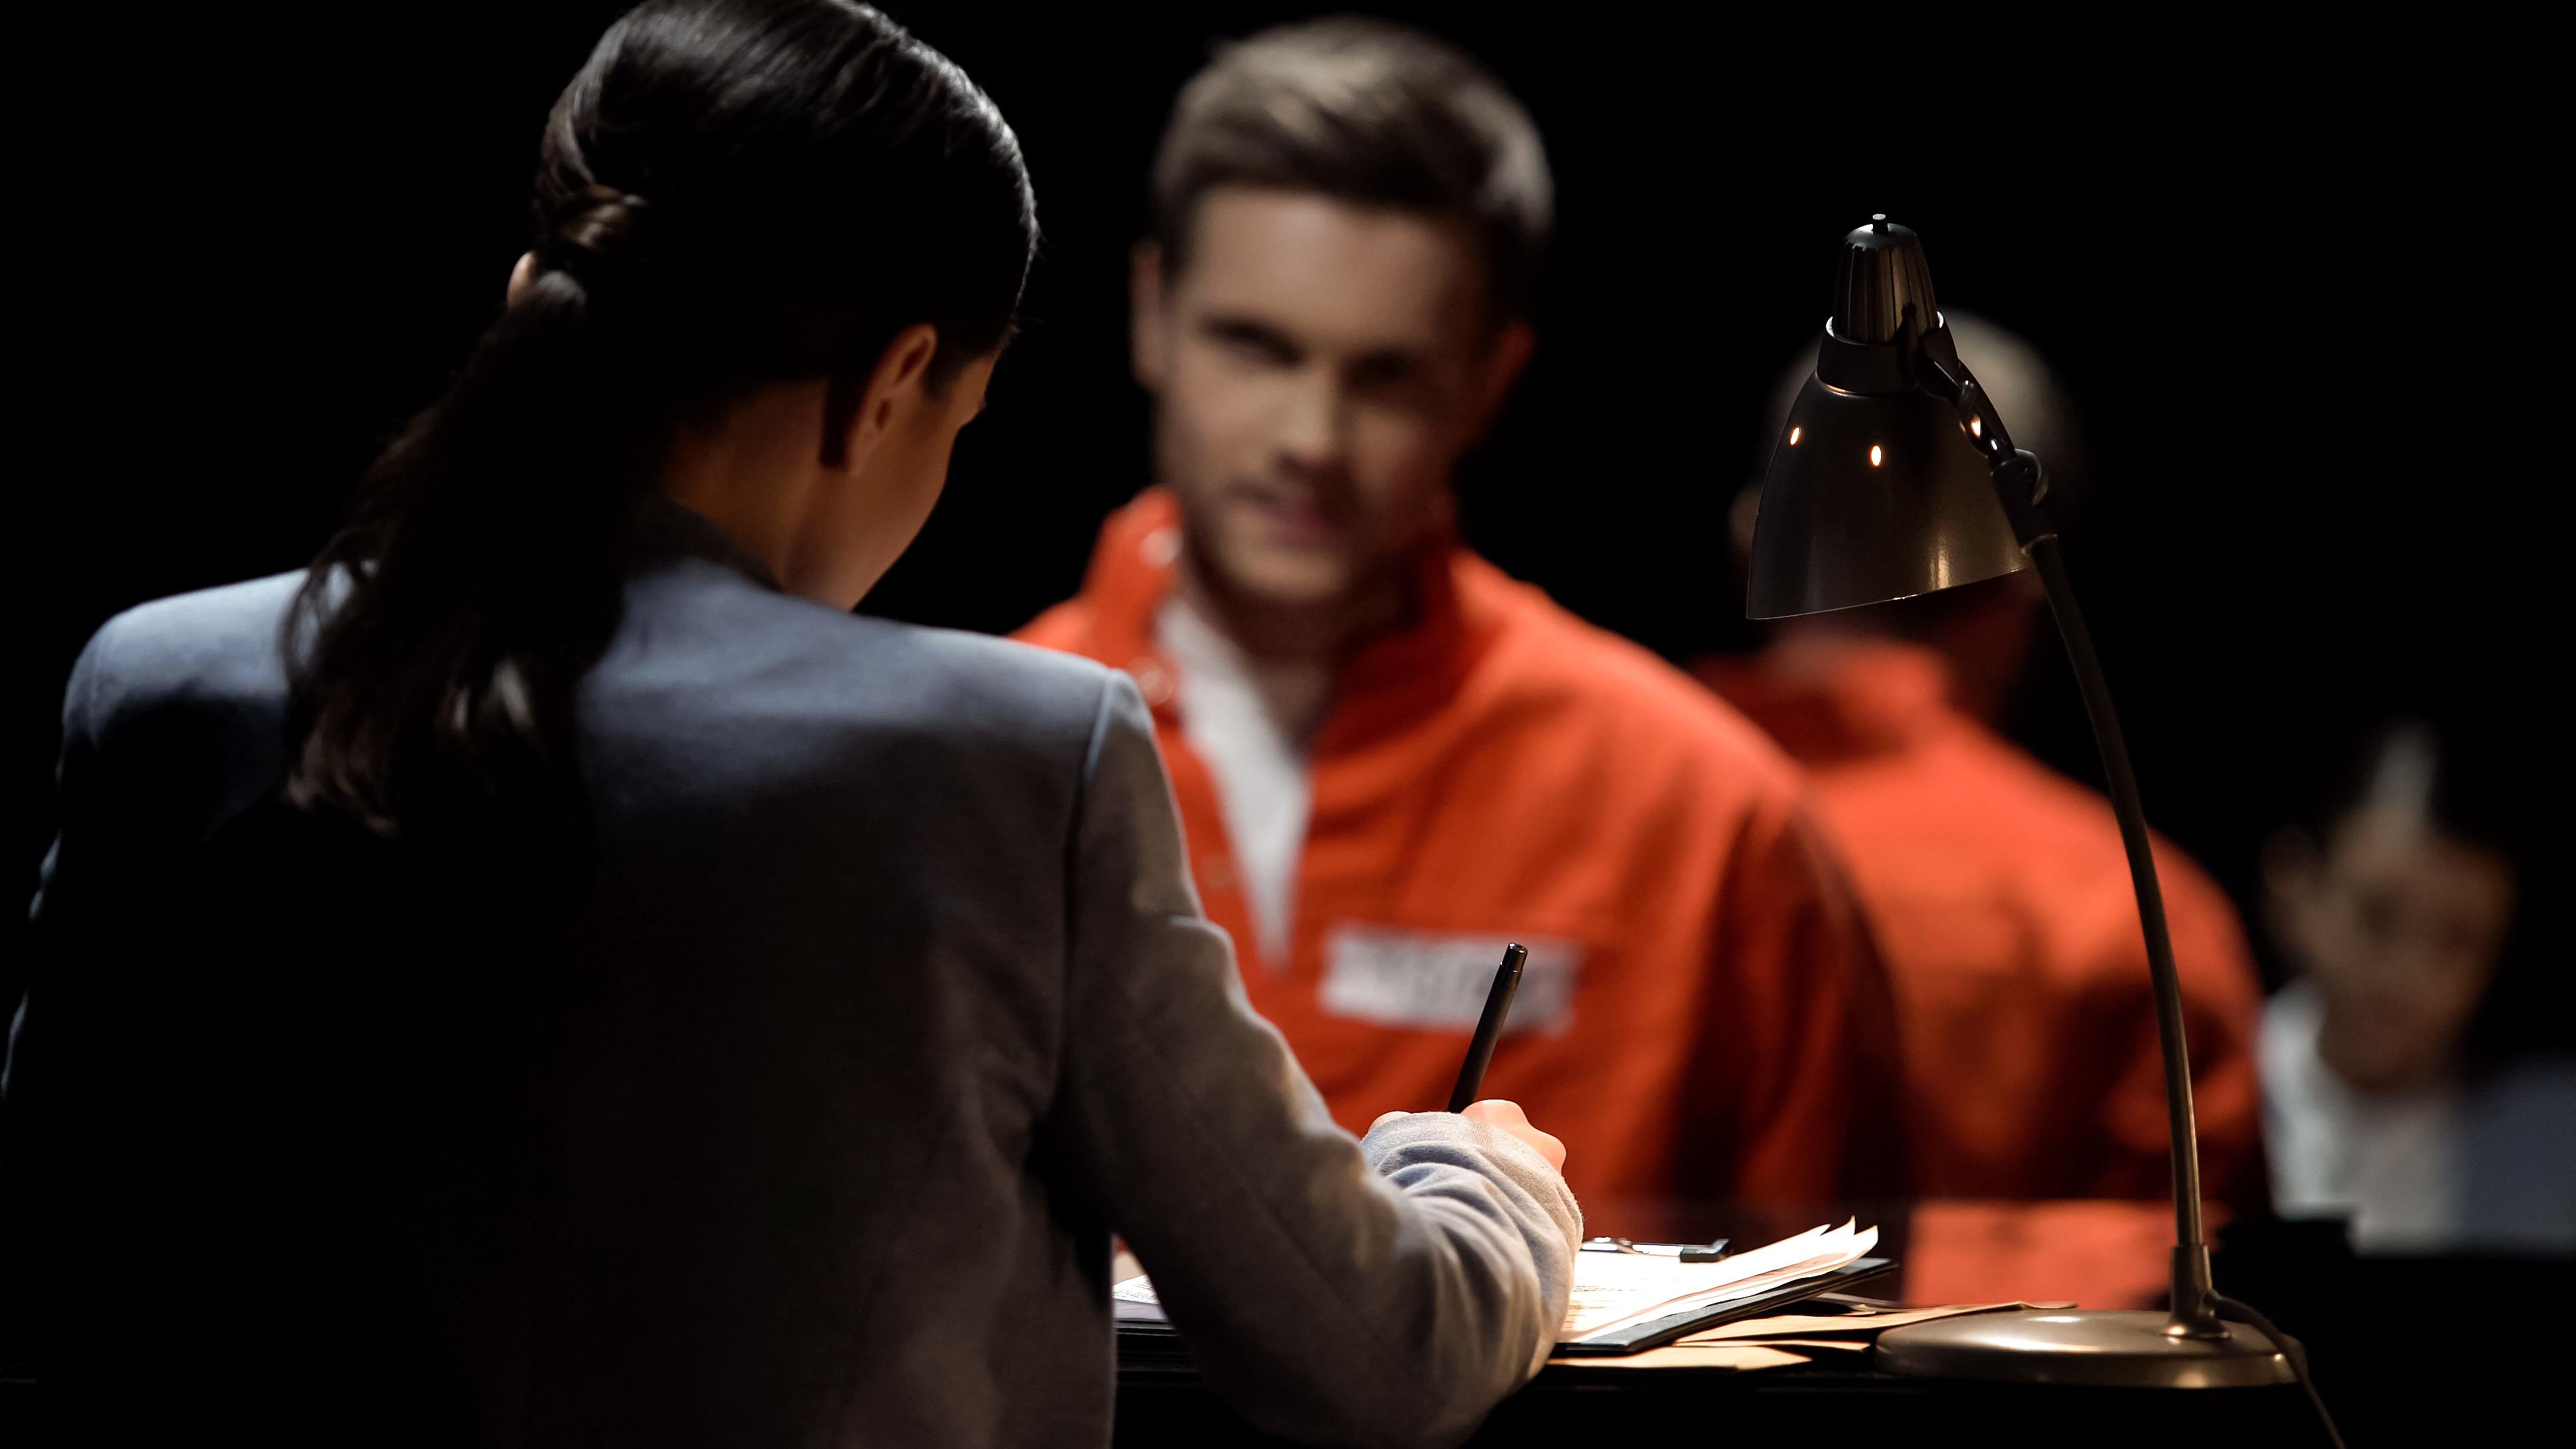 Interrogation 2019